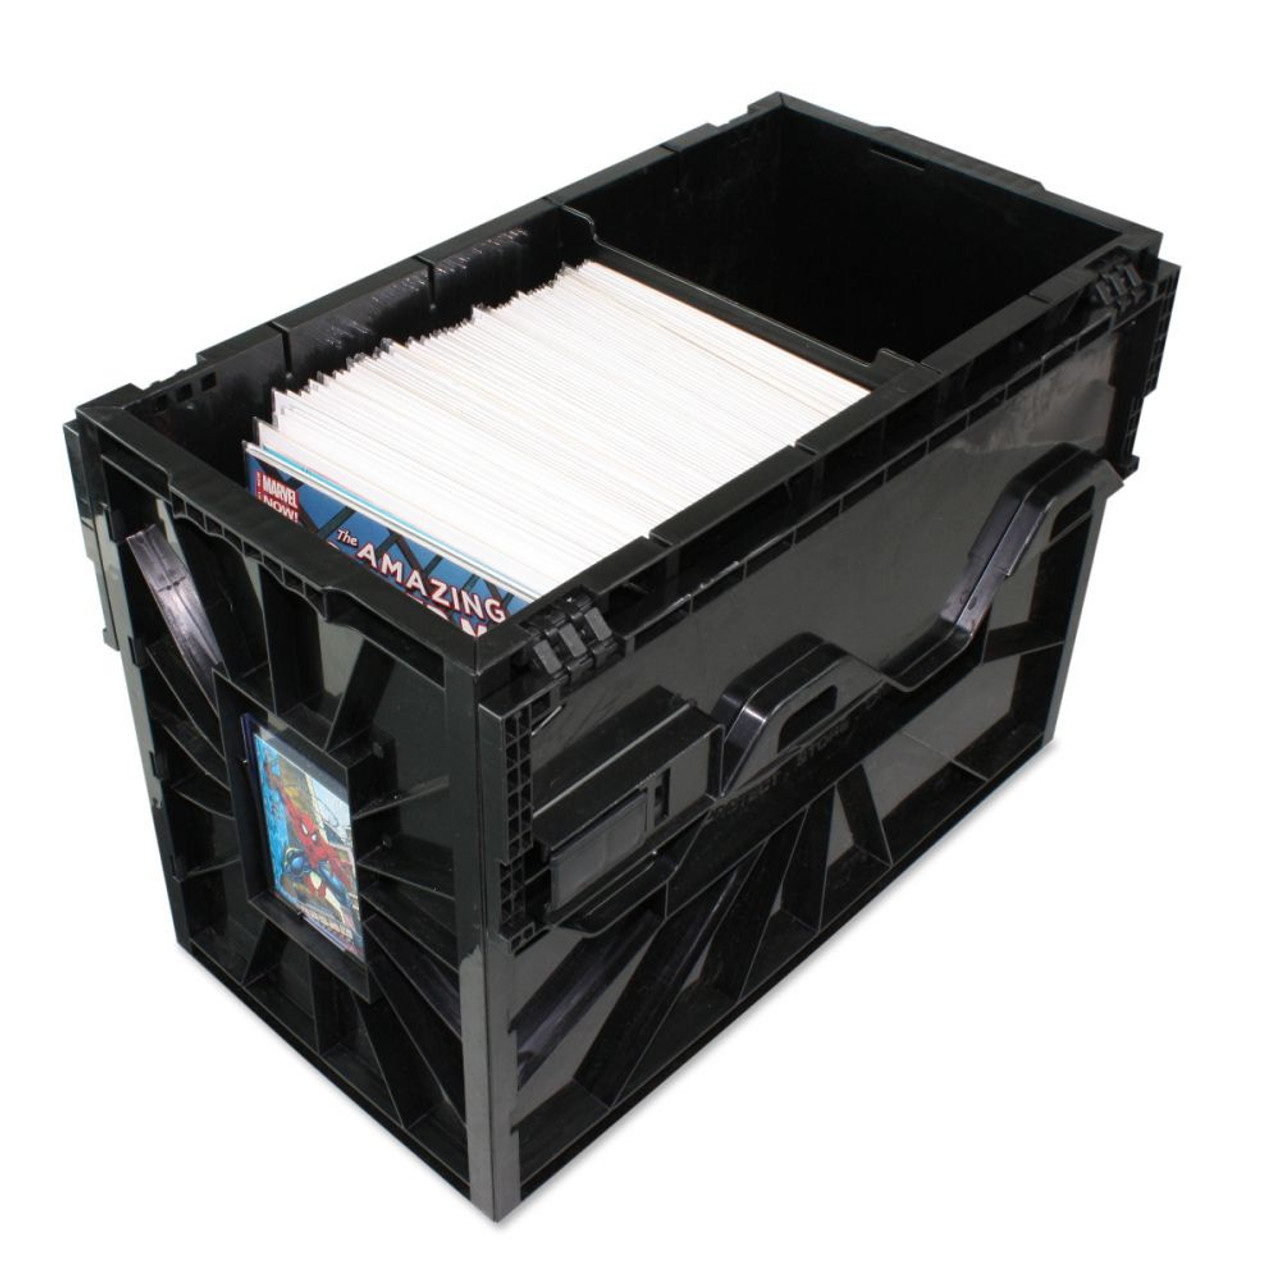 BCW Comic Book Short Box Storage Bin. The Collectors Resource